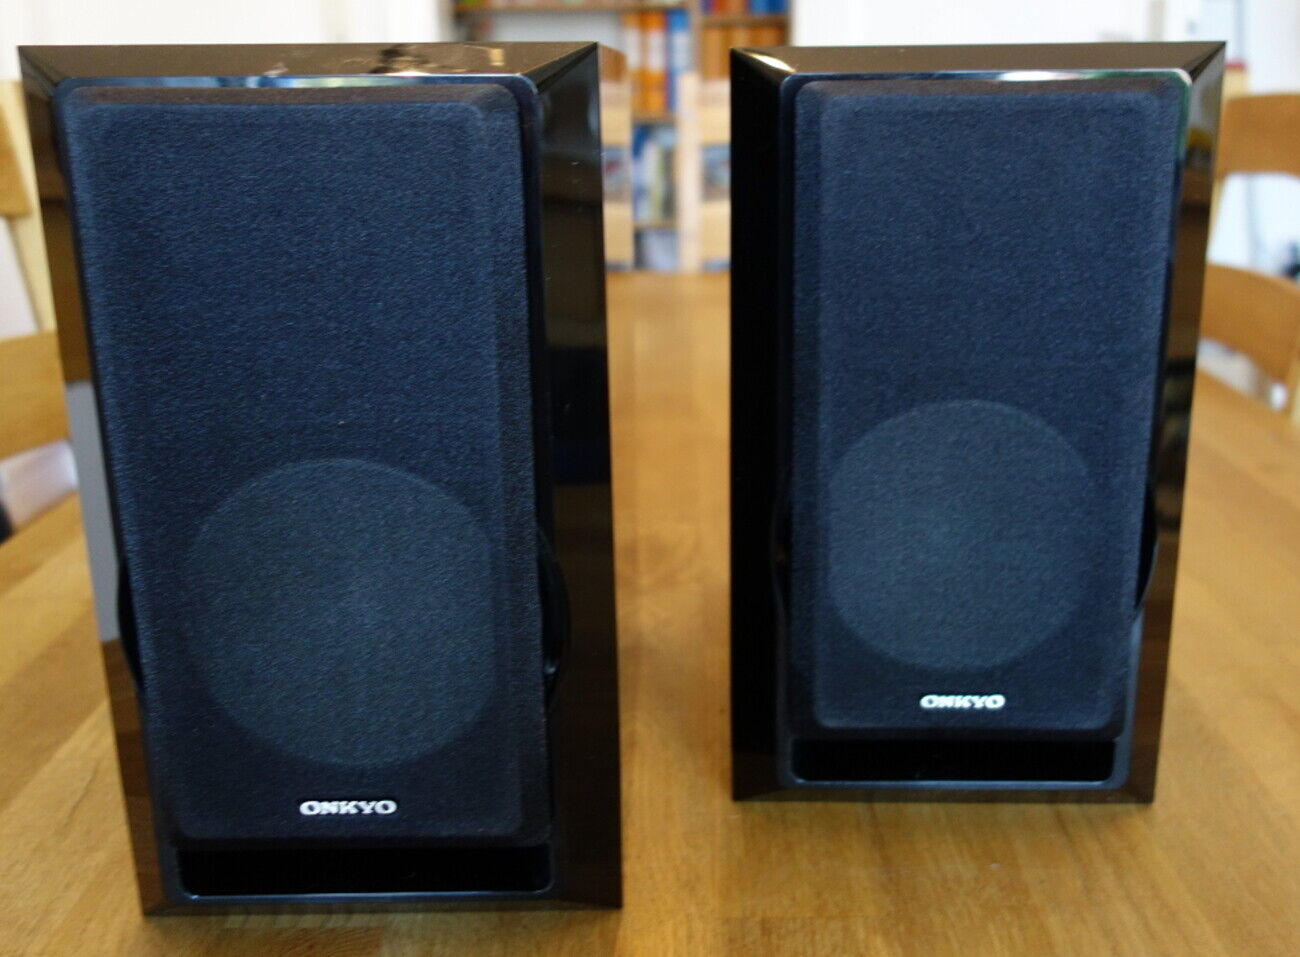 Onkyo D-525 Regallautsprecher/Boxen, schwarz, hochglanz, toller Klang